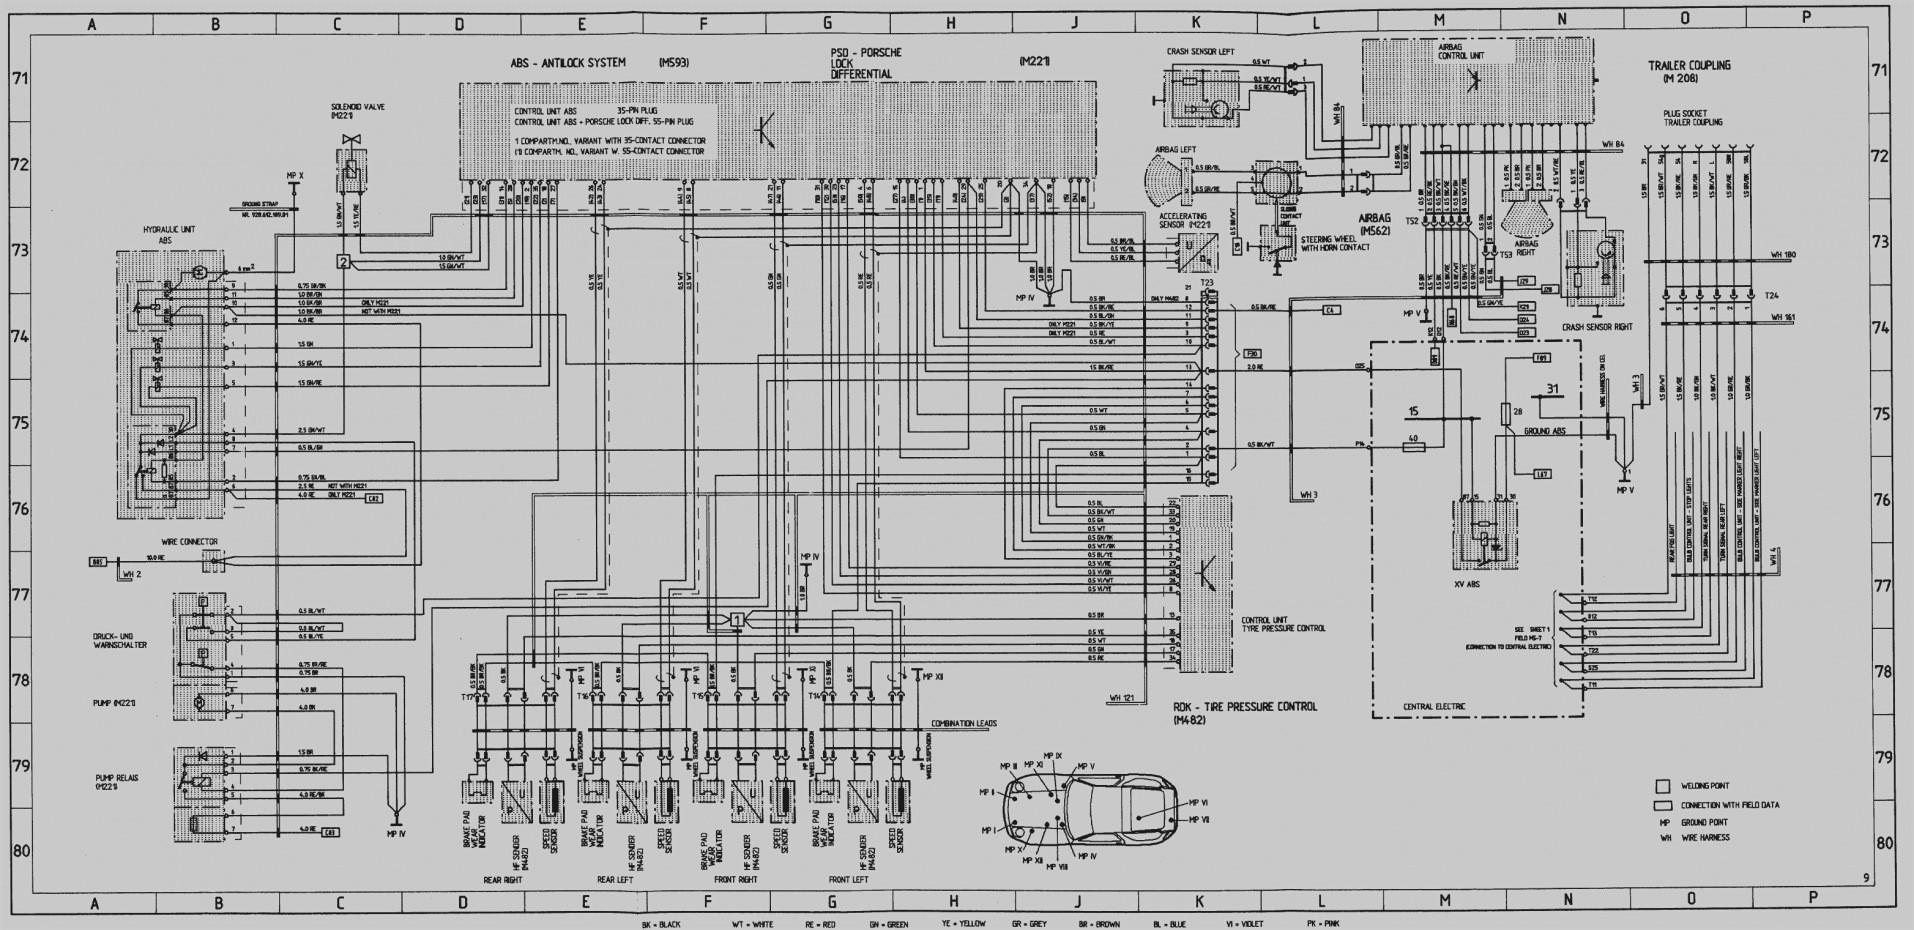 Bmw E46 Trunk Wiring Diagram Wire Data Schema \u2022 2001 BMW 525I Wiring  Schematics Bmw E46 Trunk Wiring Harness Diagram